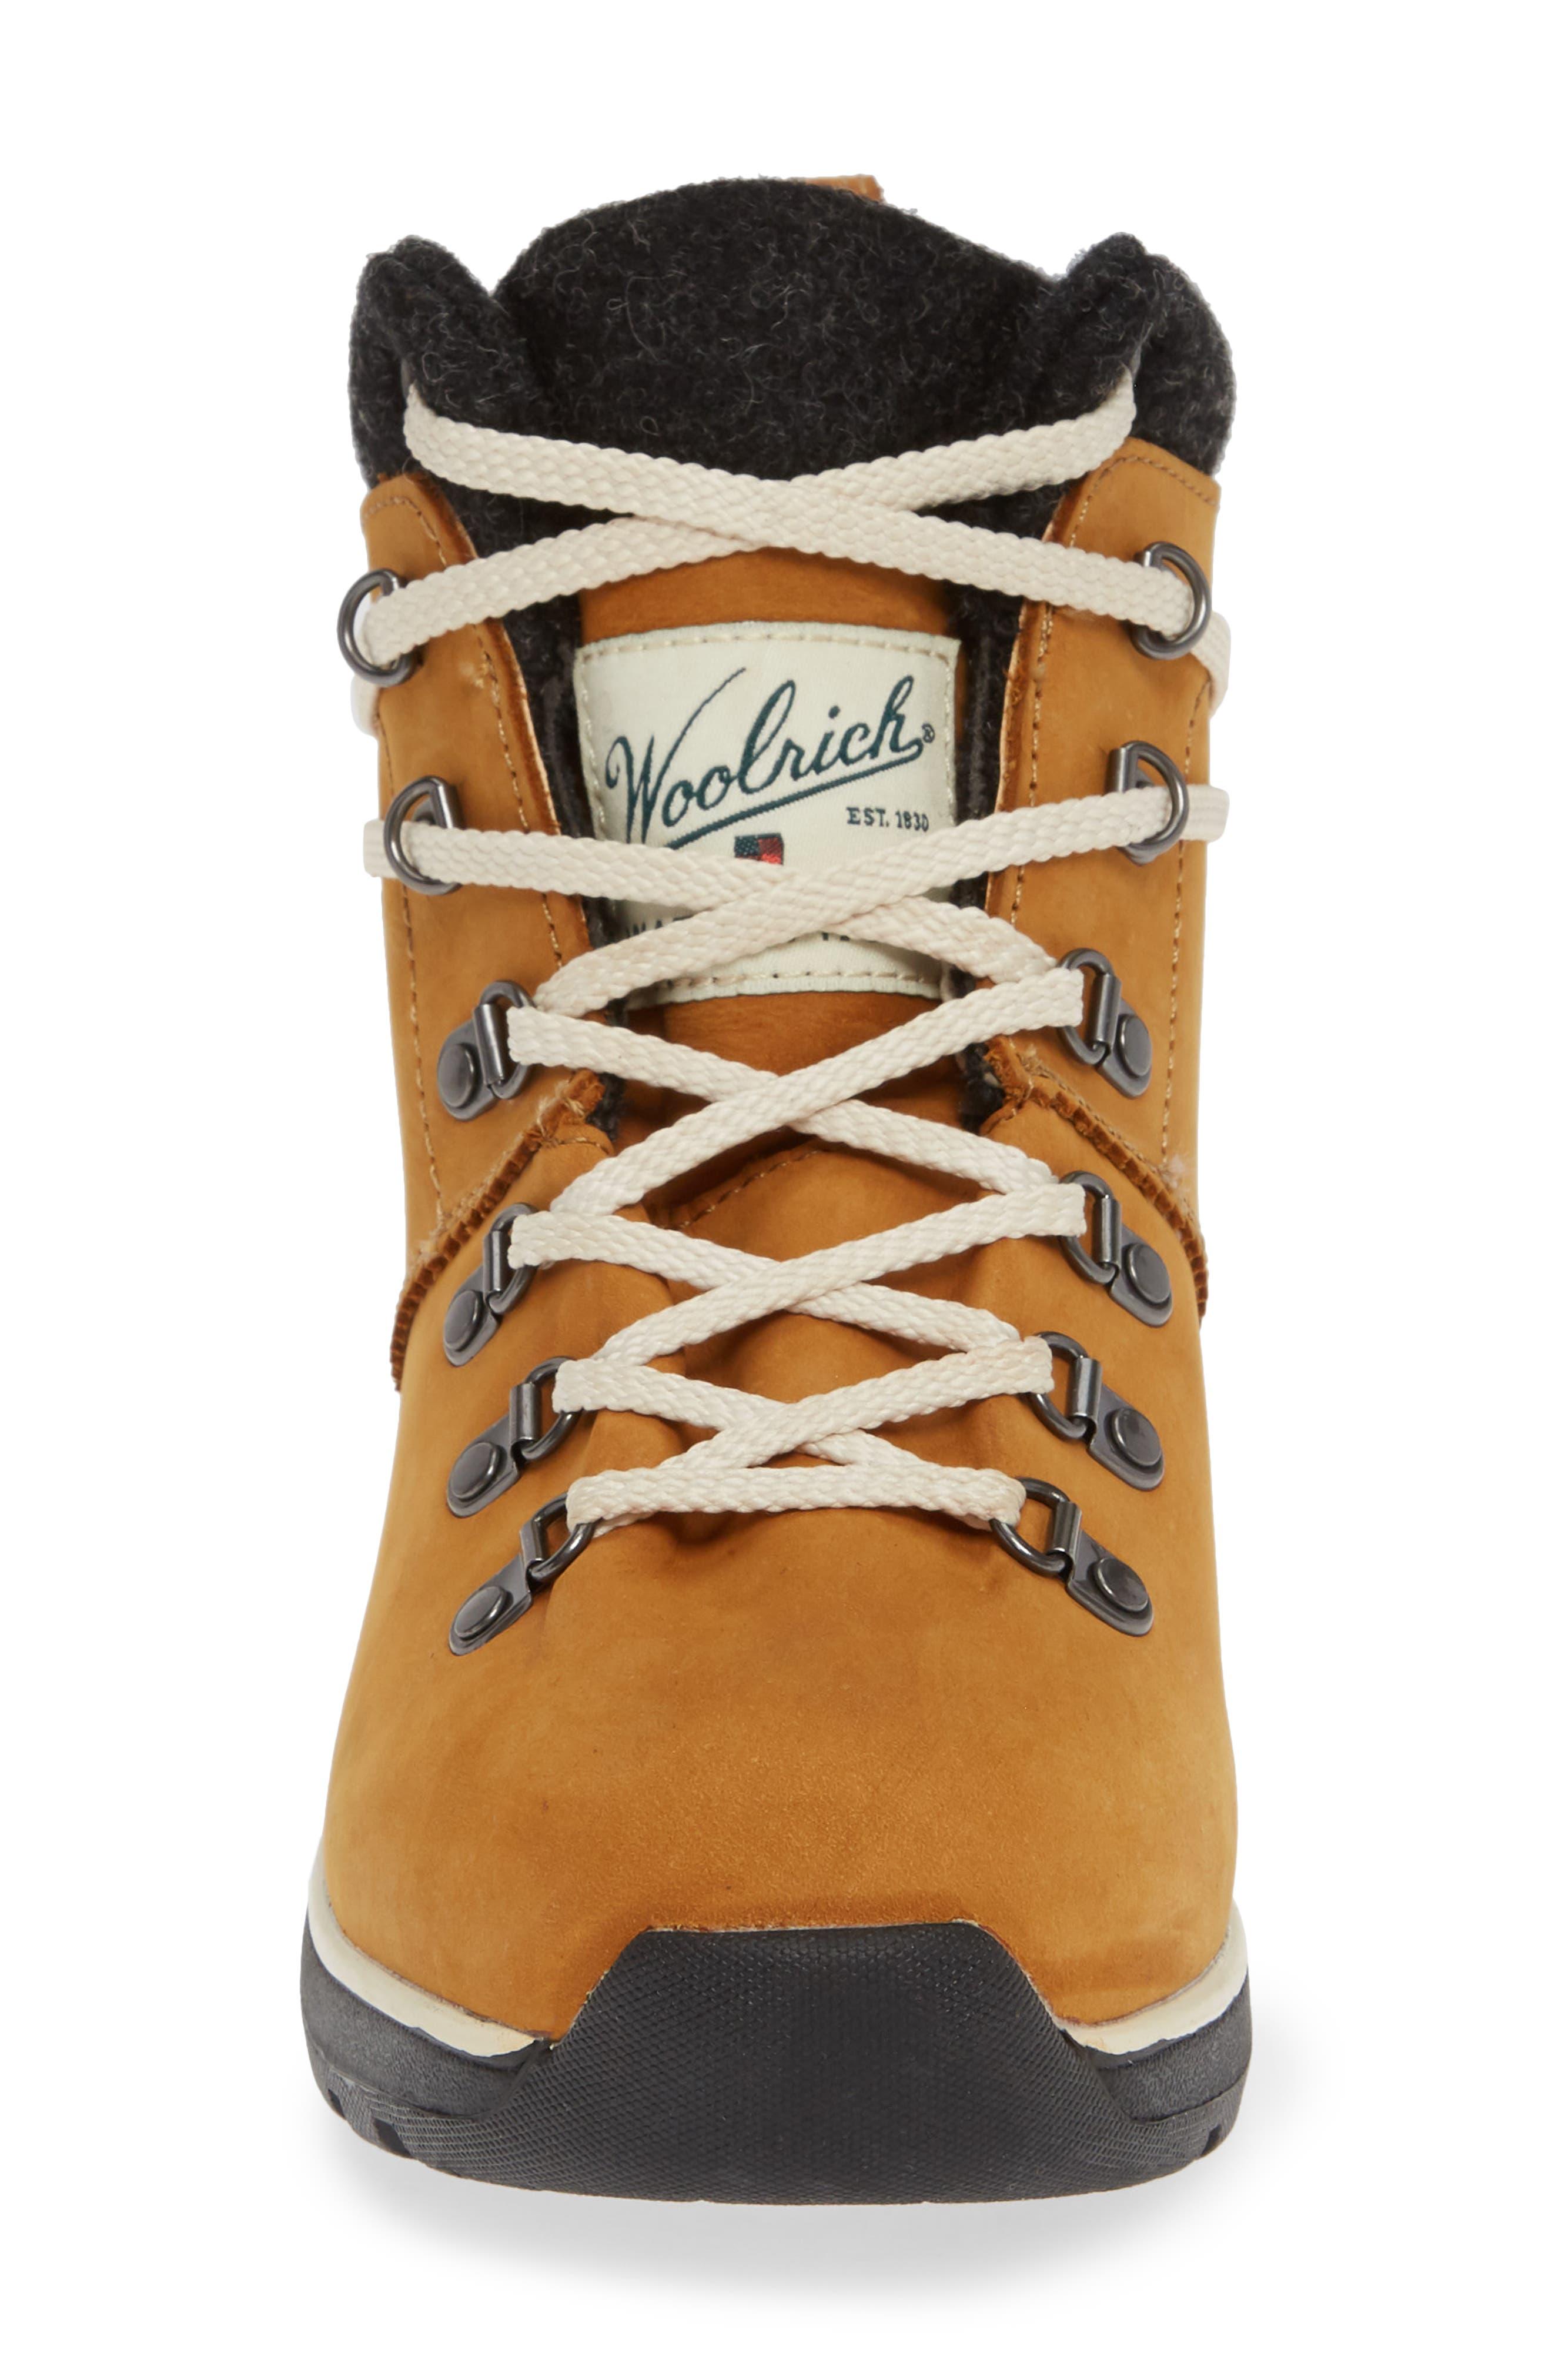 Rockies II Waterproof Hiking Boot,                             Alternate thumbnail 4, color,                             CONKER LEATHER